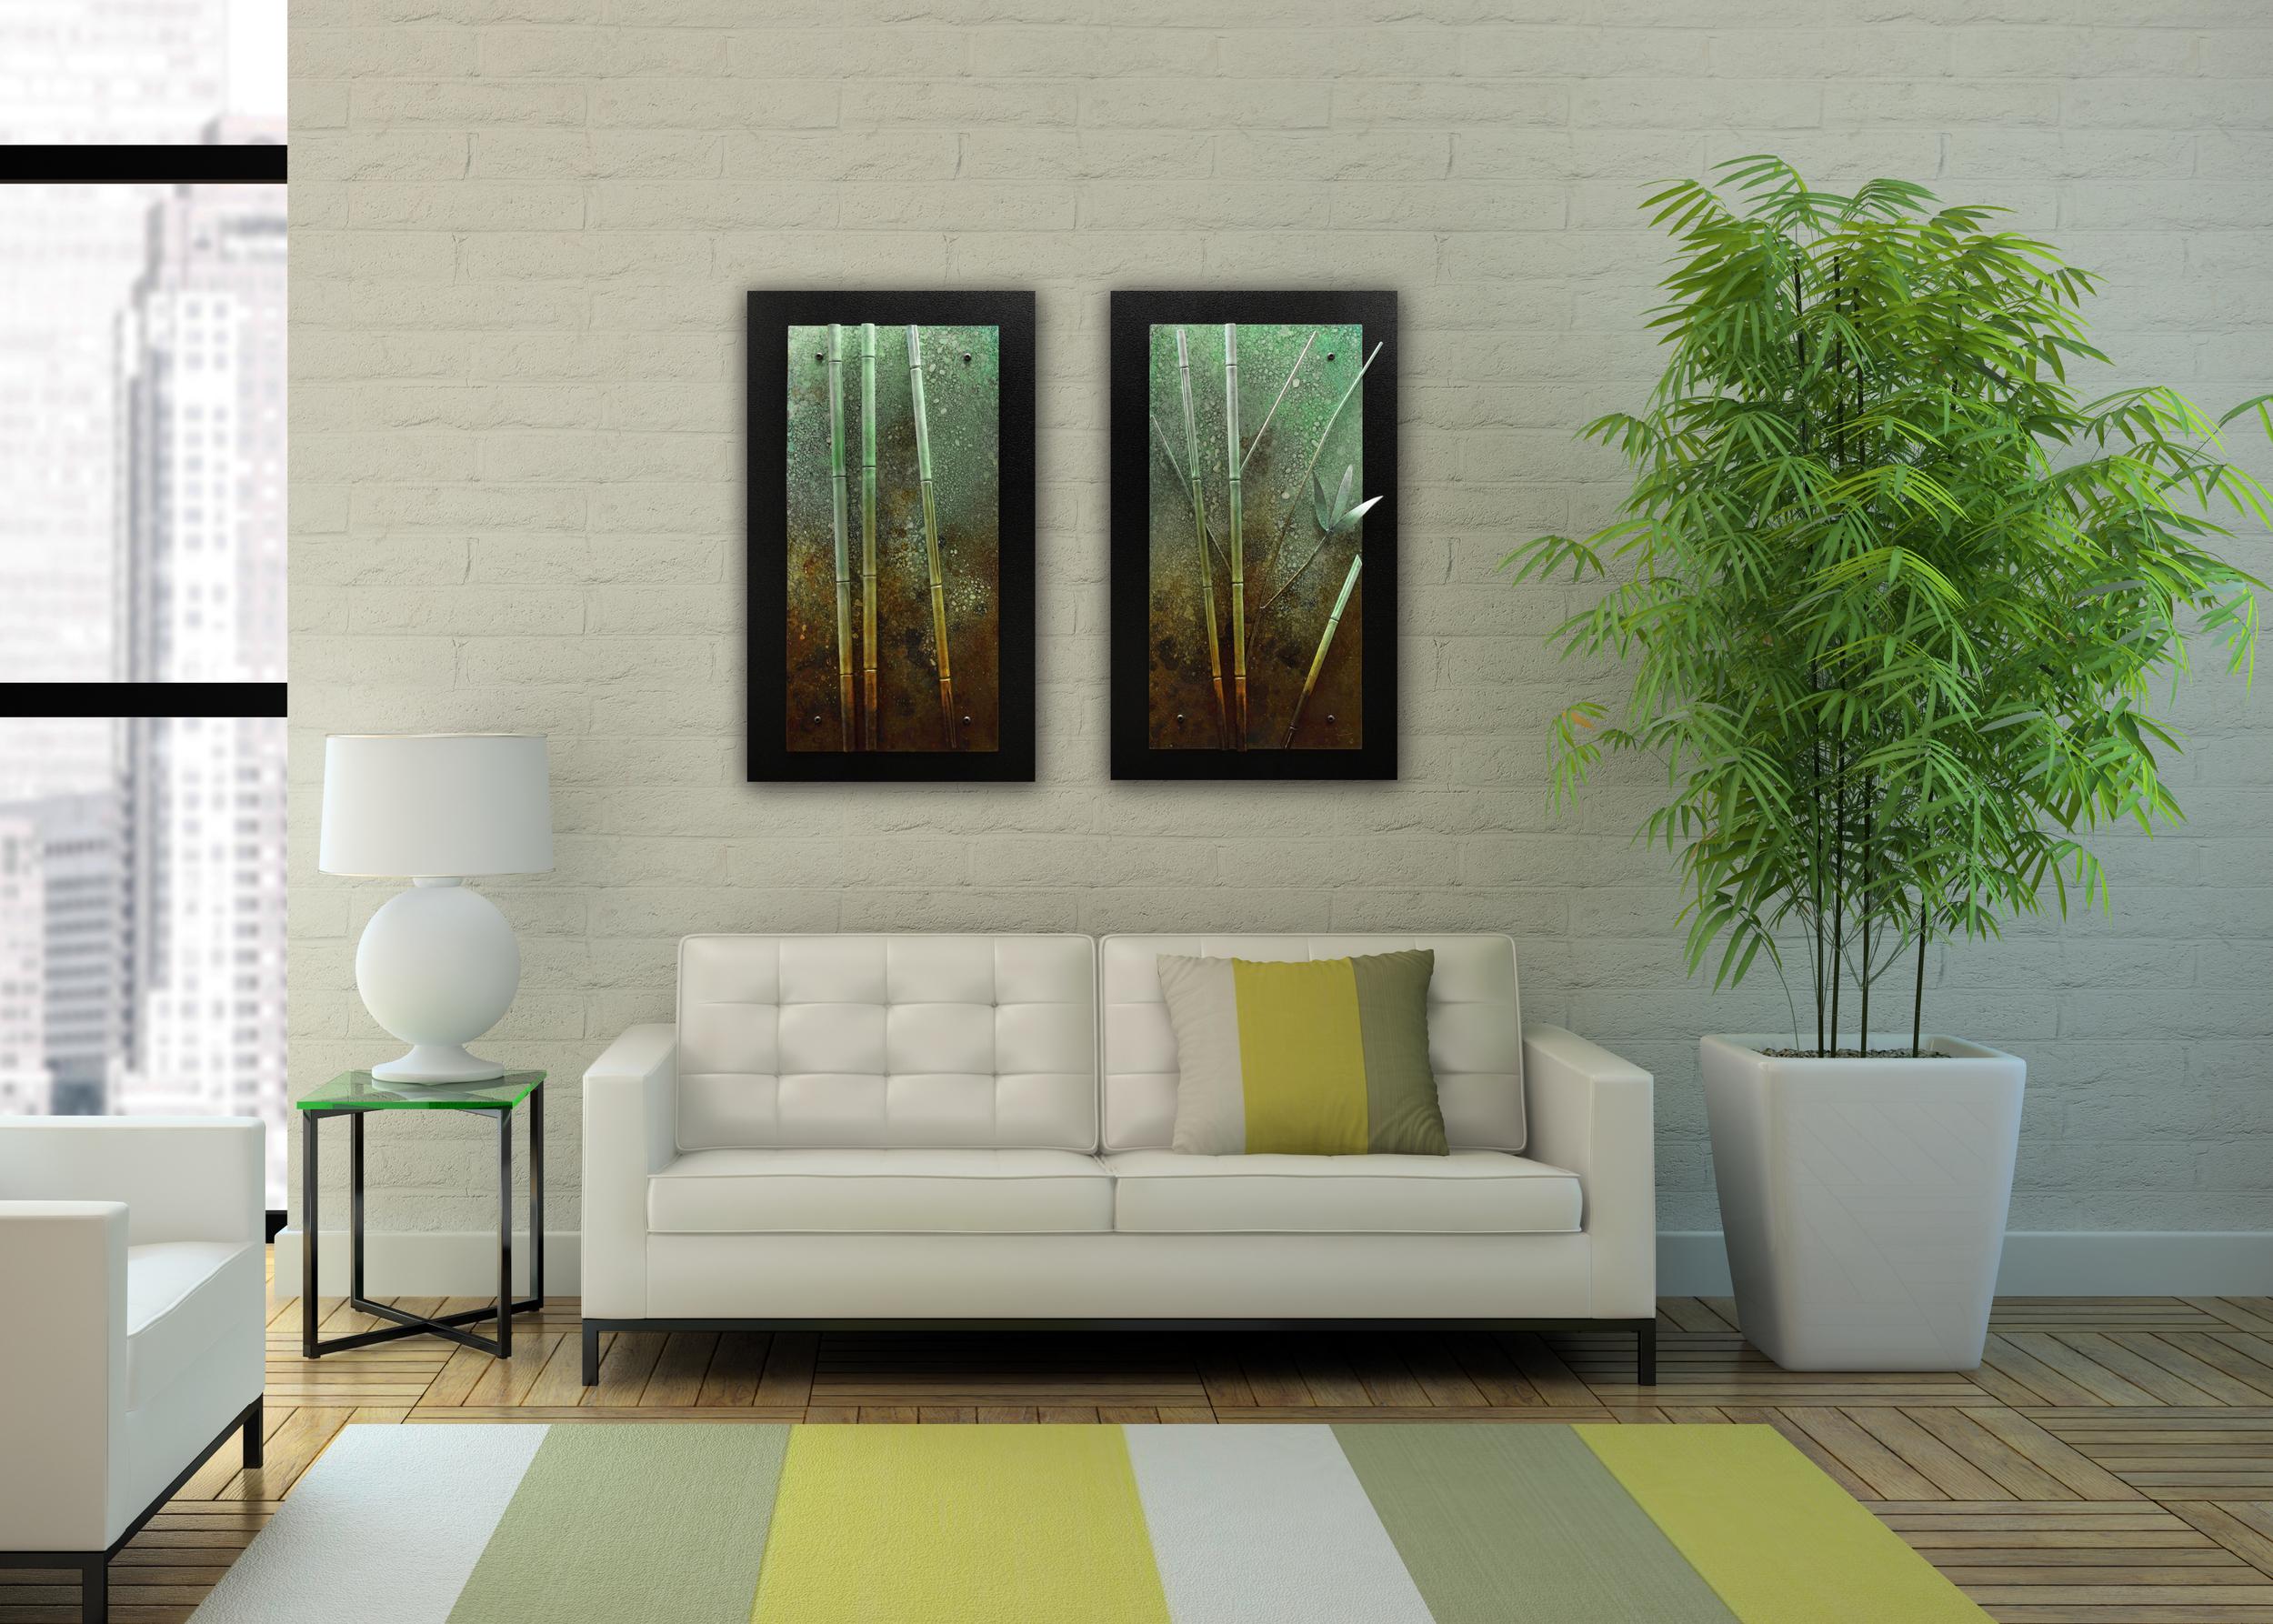 green and yellow interior 2.jpg